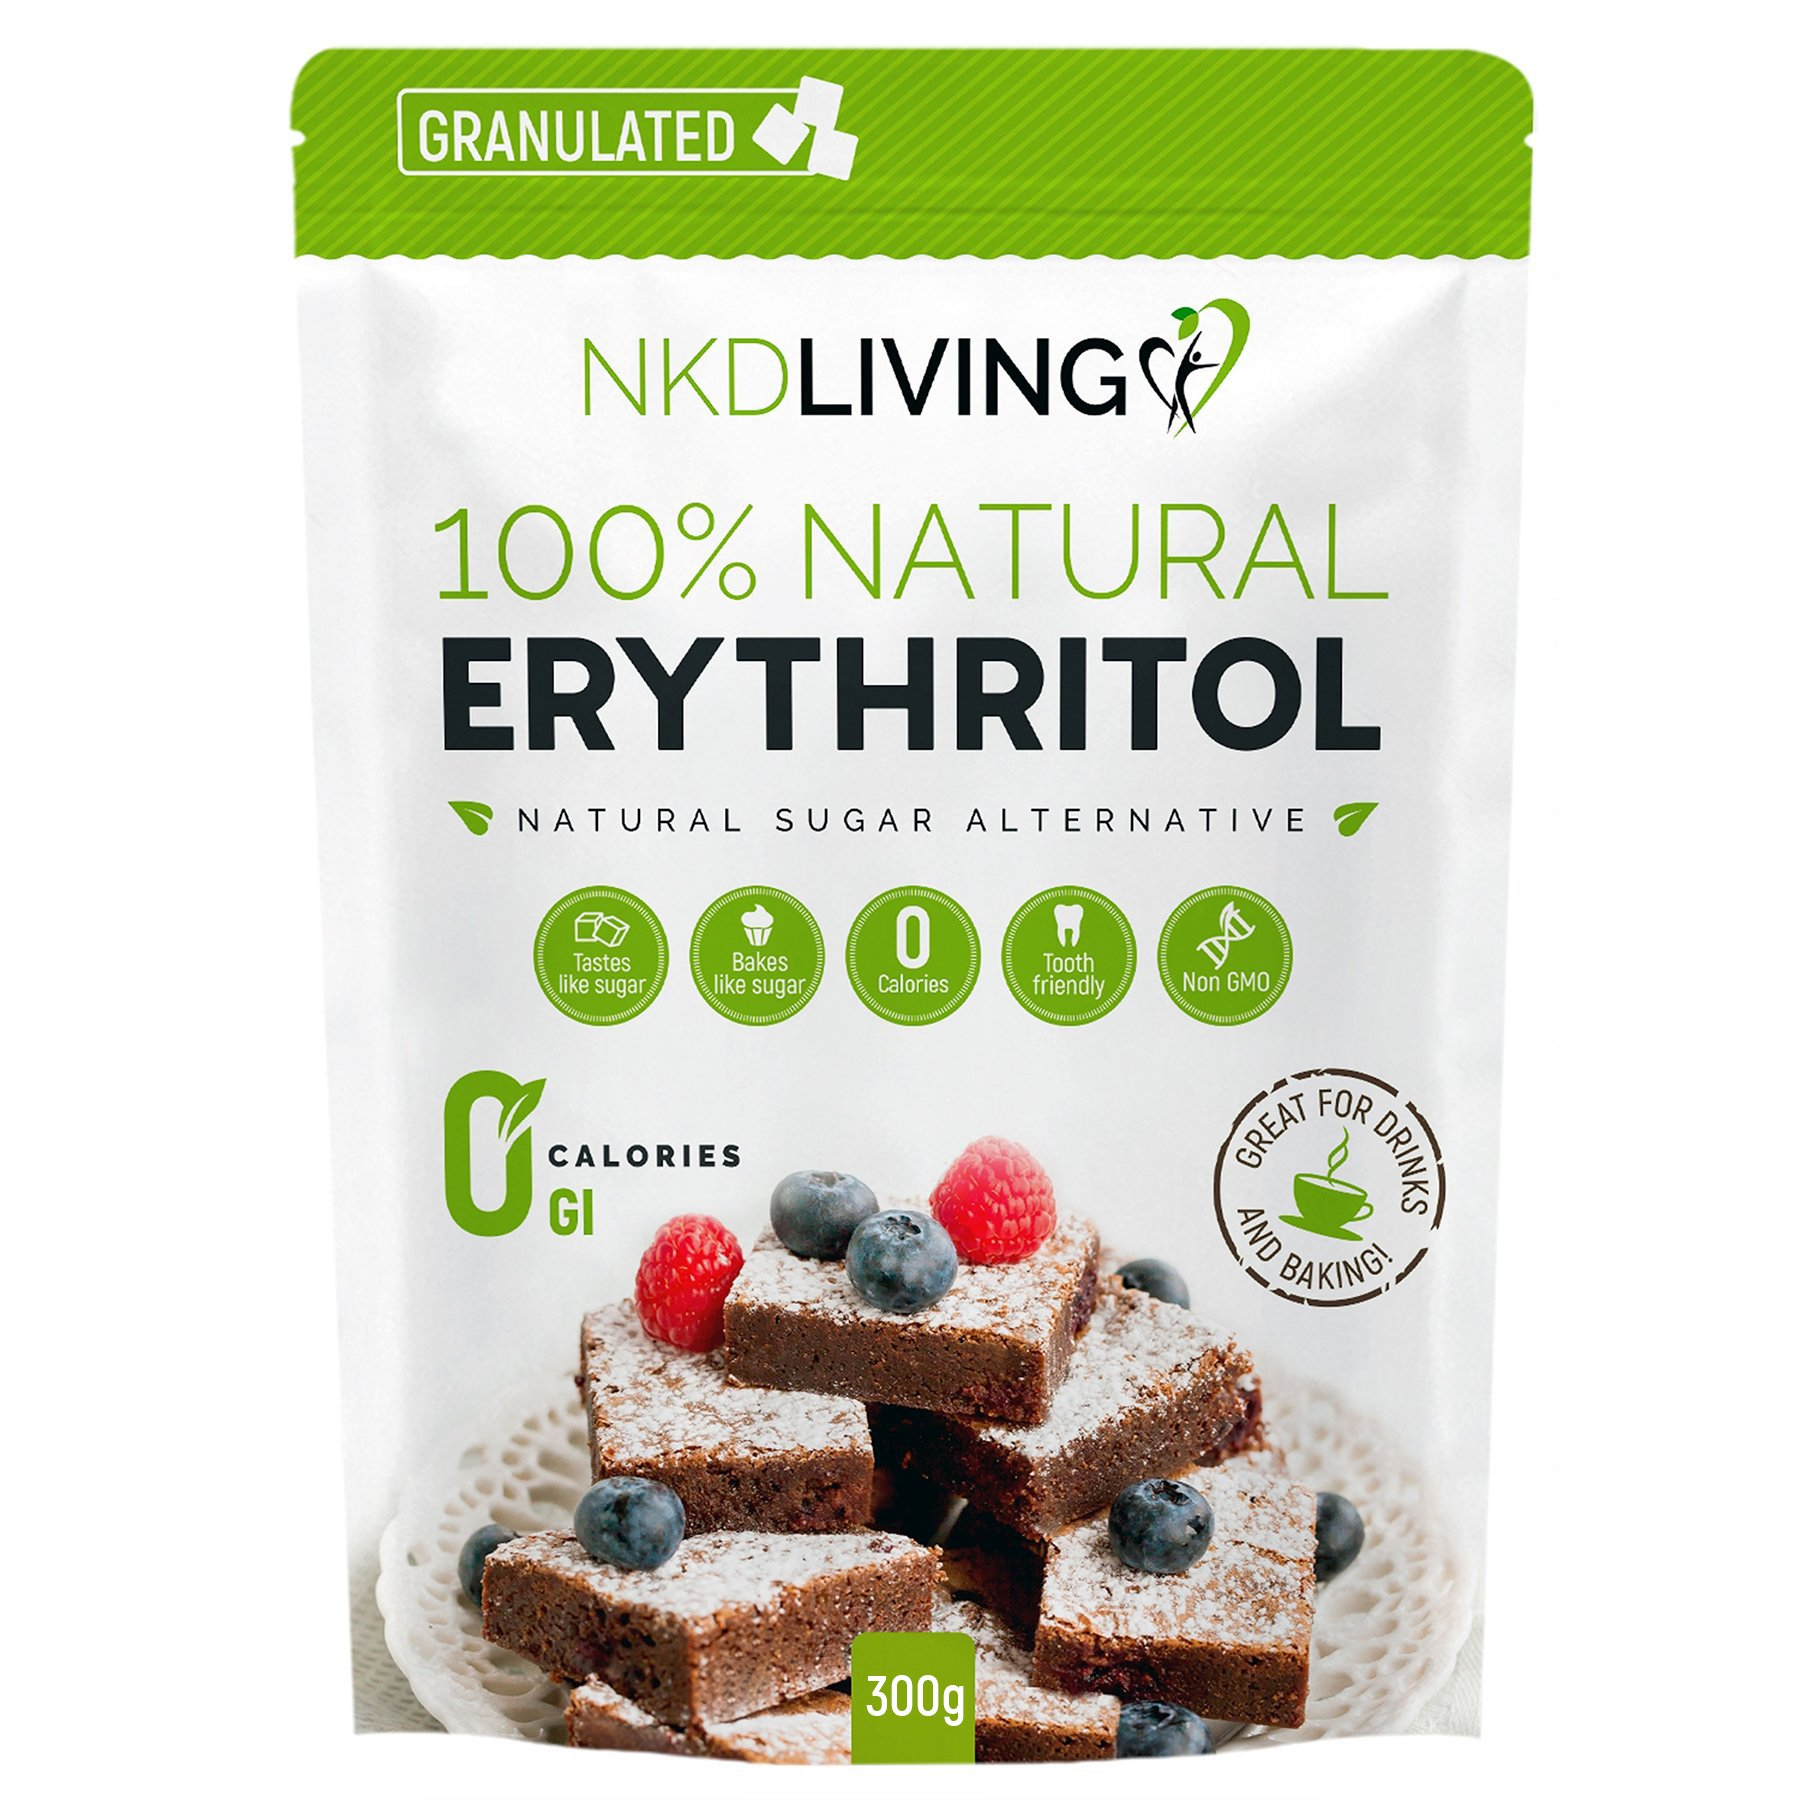 NKD Living granulated erythritol